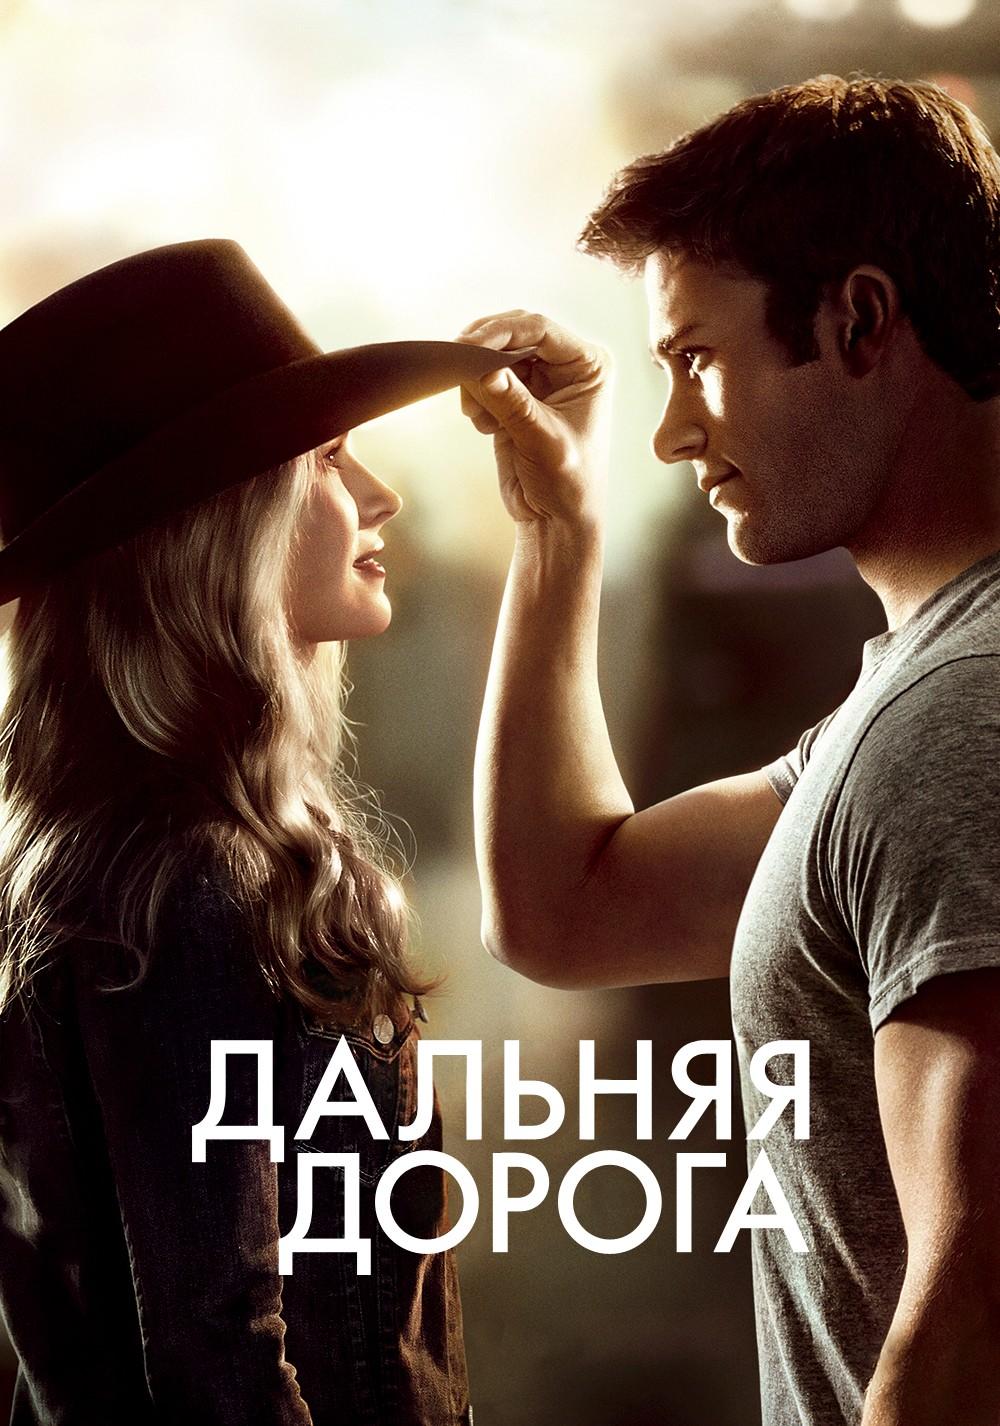 Экранизации романов Николаса Спаркса